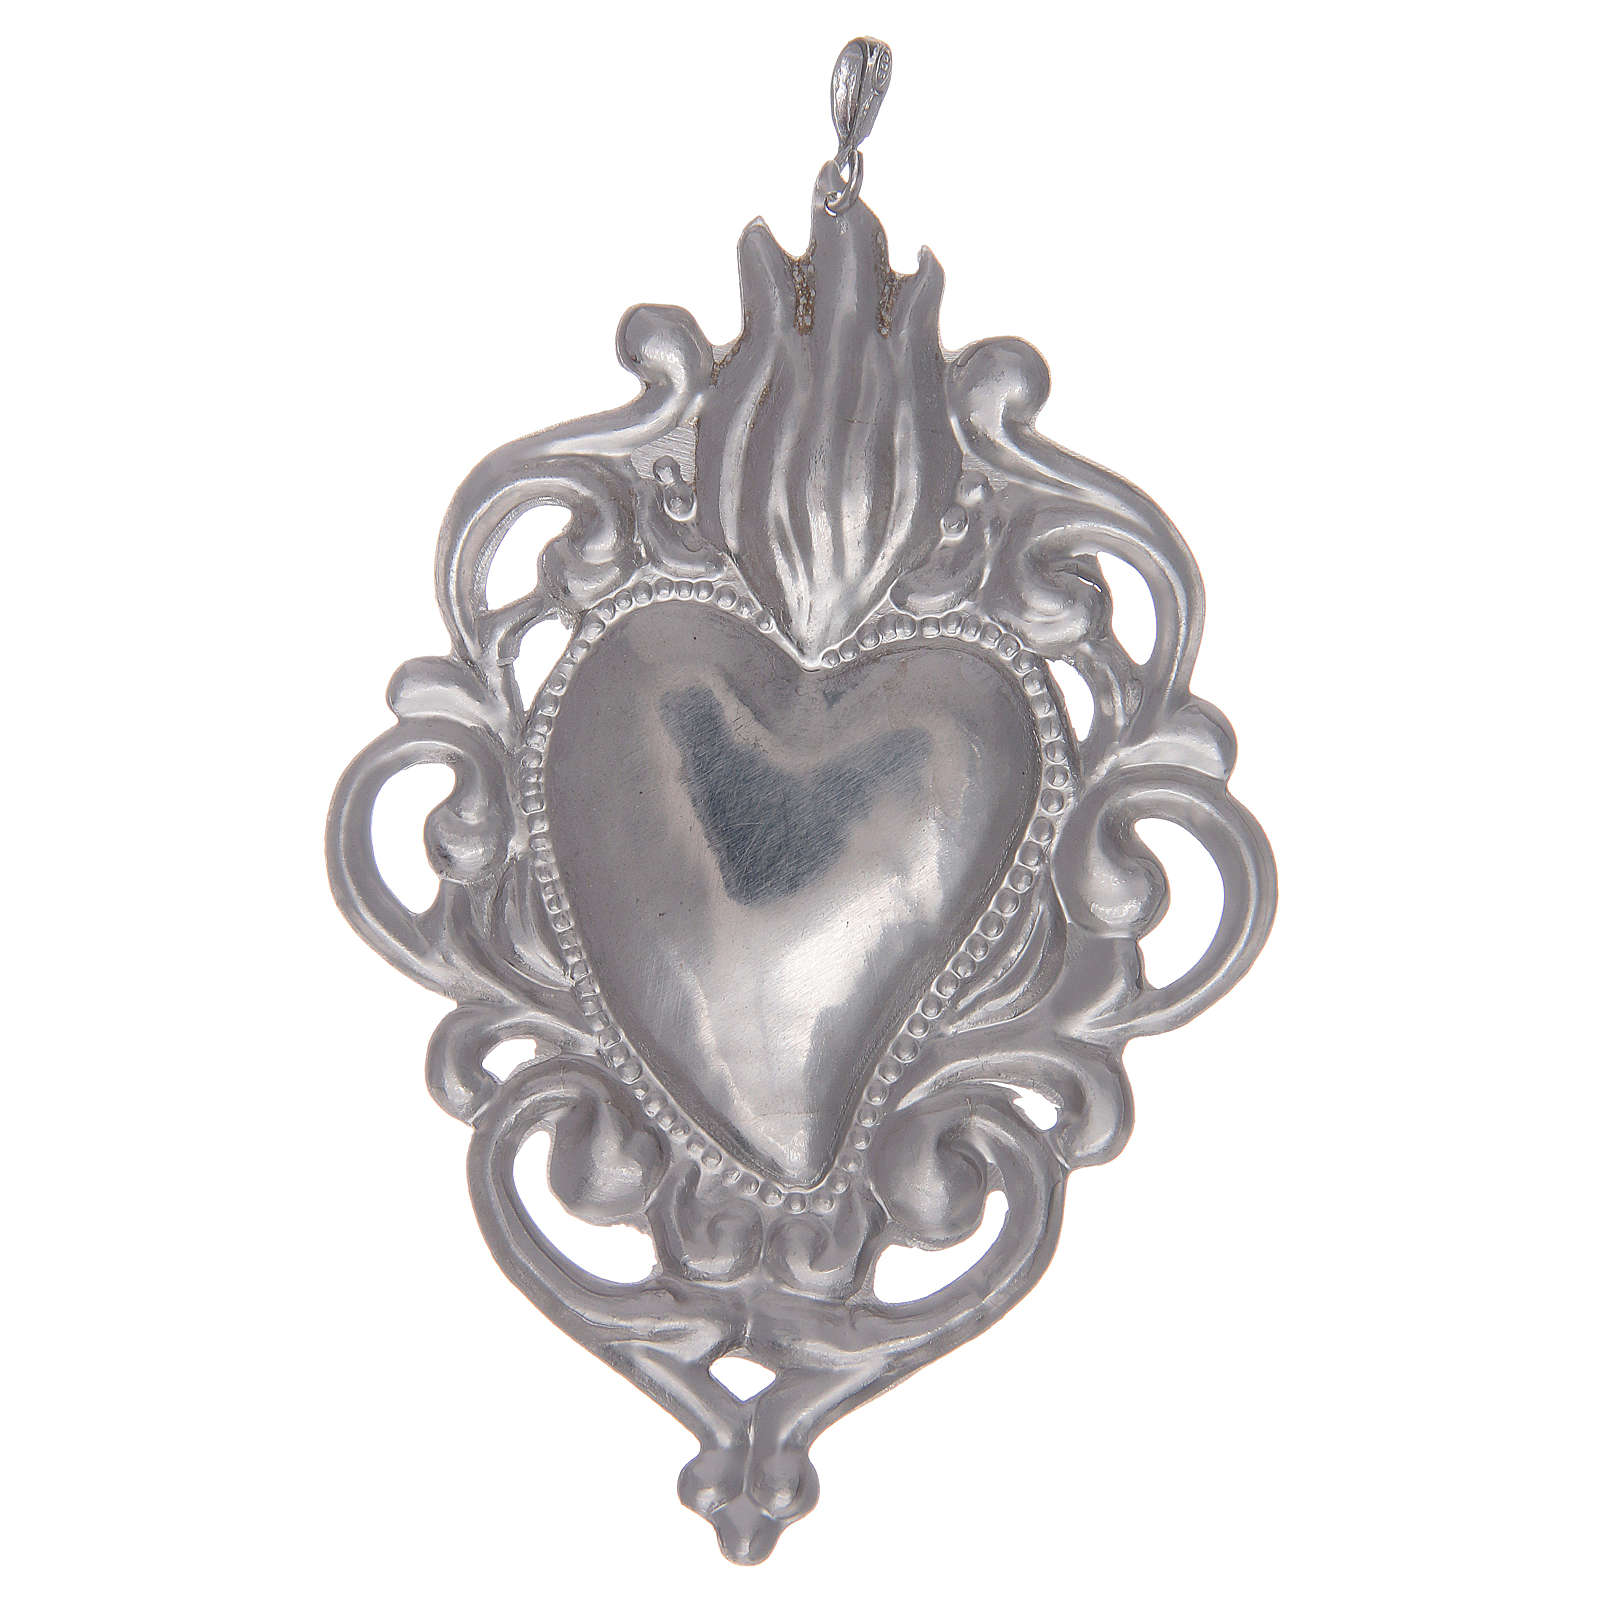 Votive 925 sterling silver pendant 4